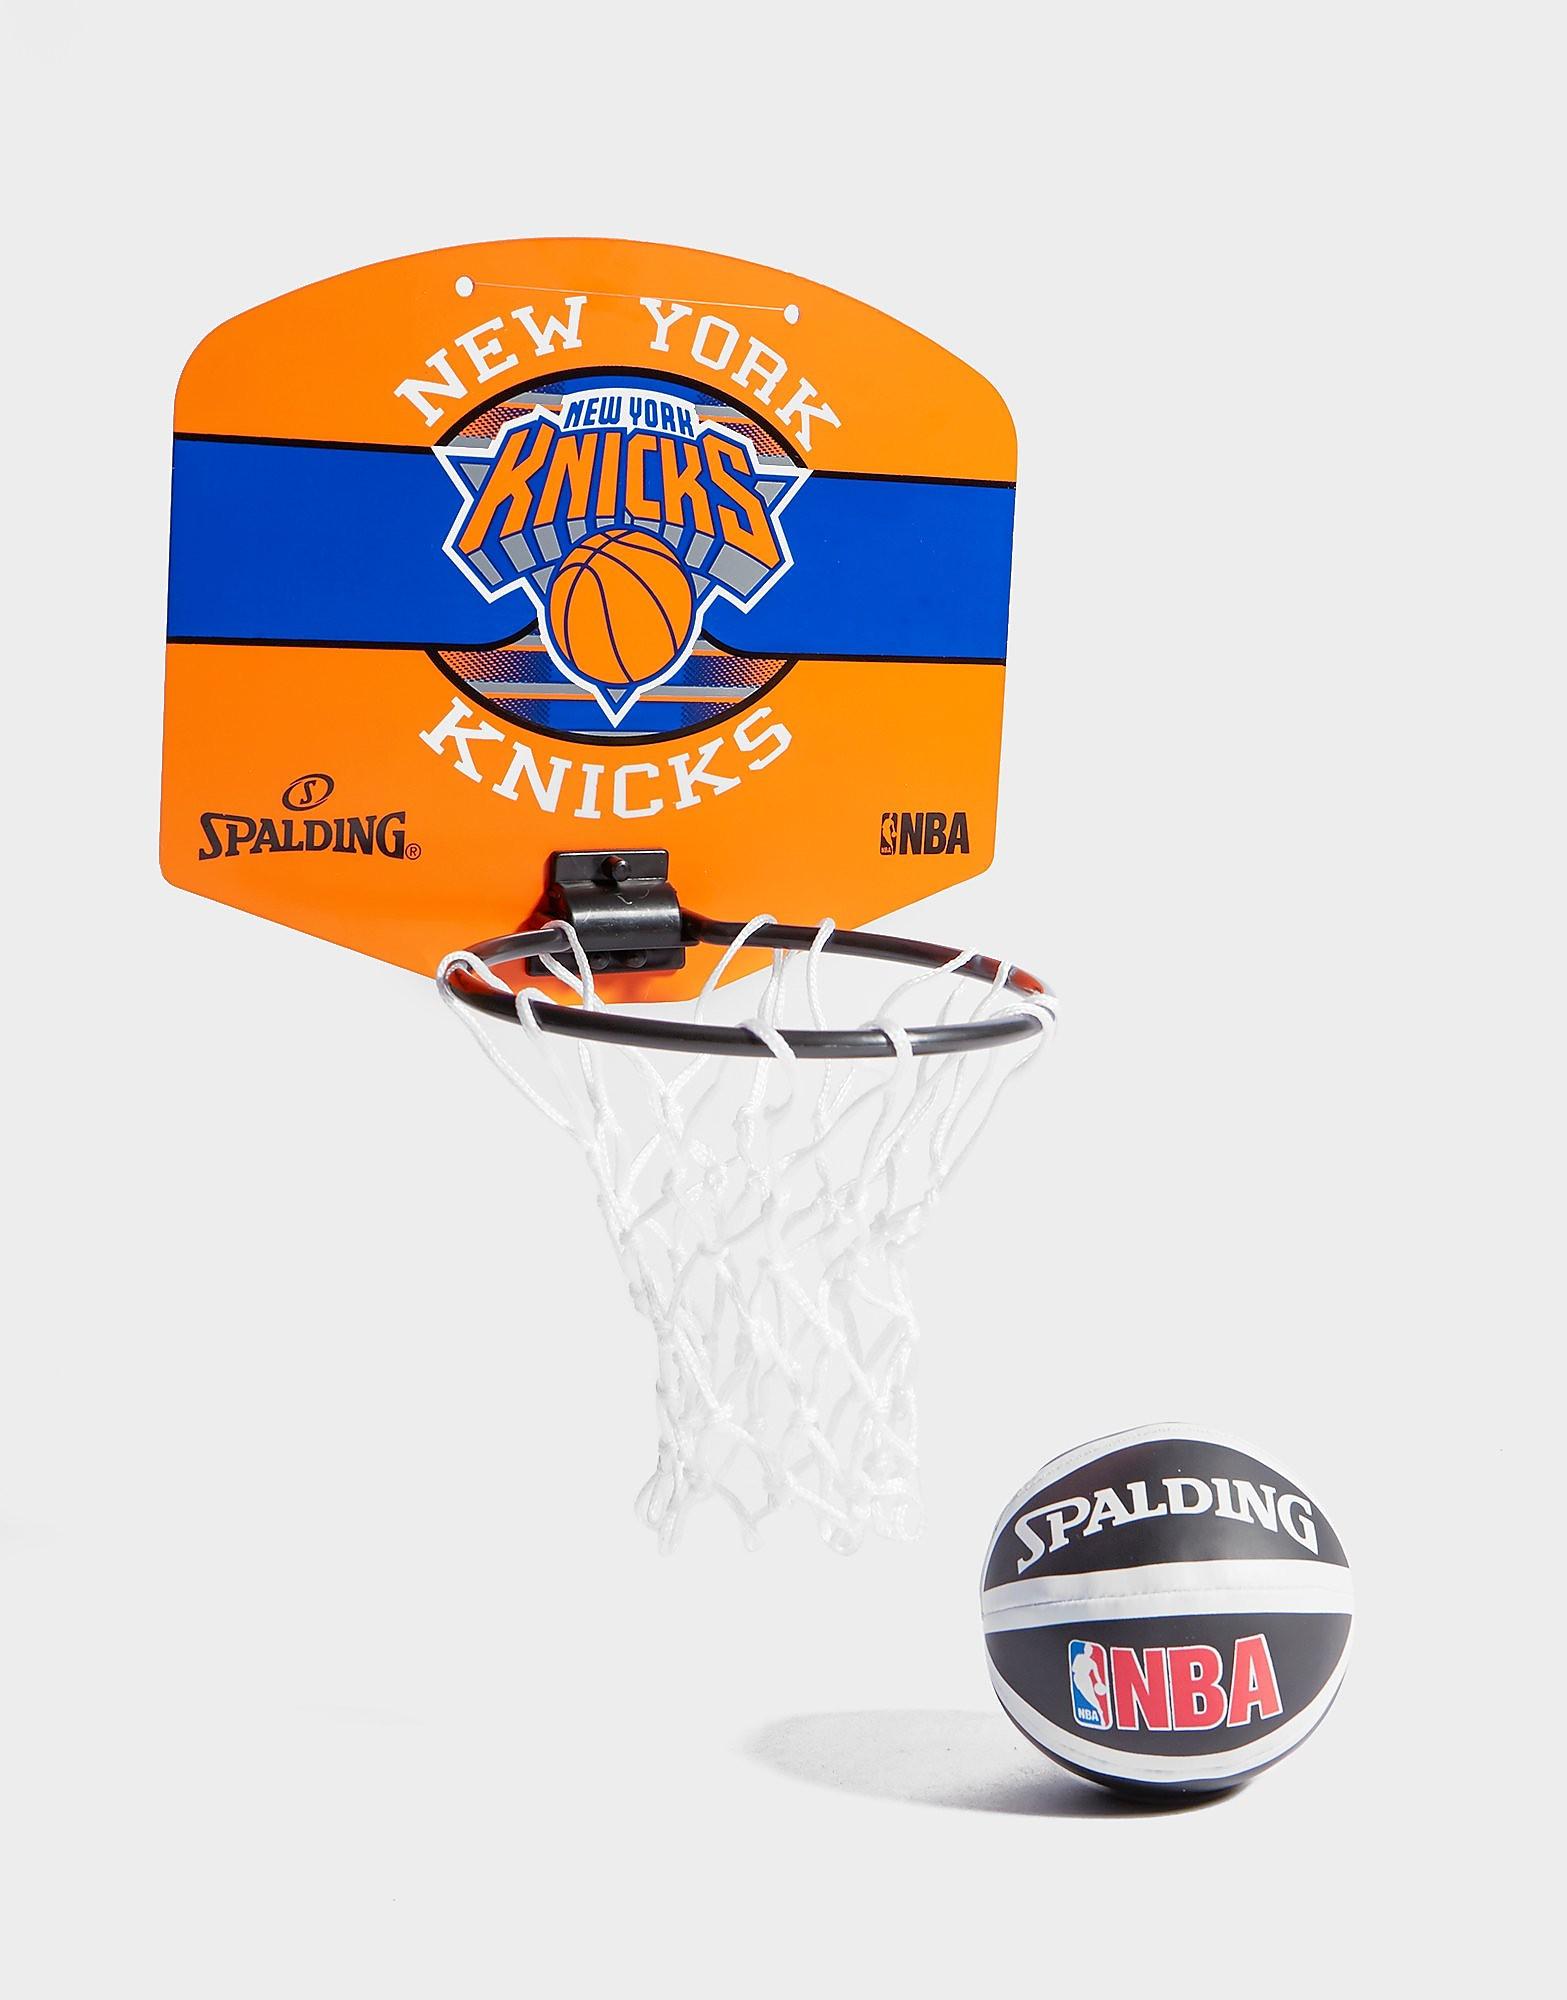 Spalding NBA New York Knicks Miniboard